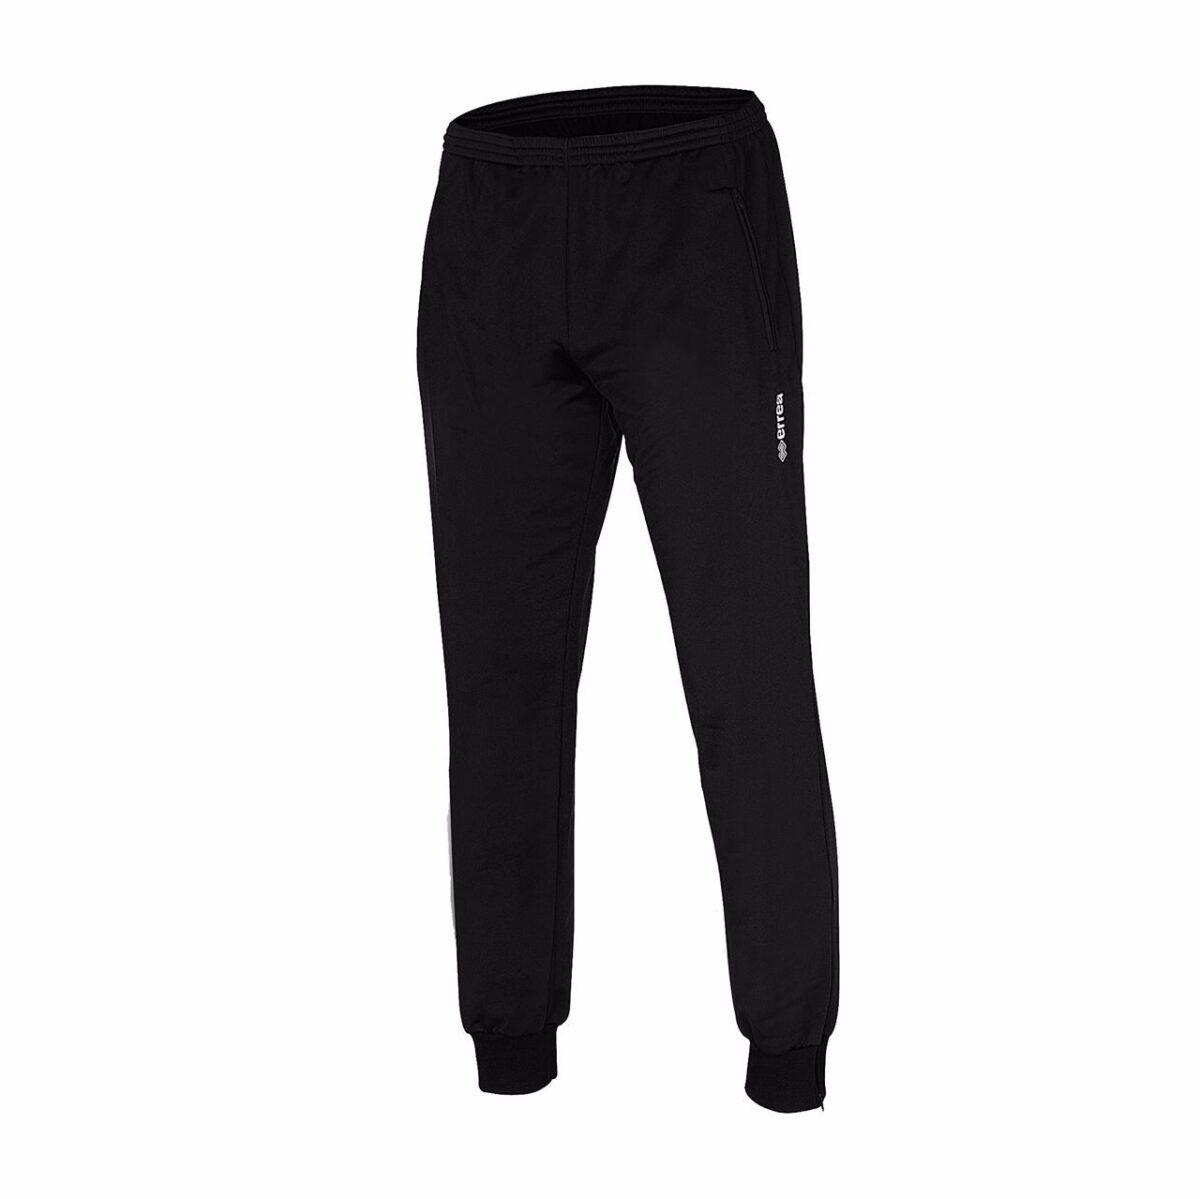 Errea SINTRA 3.0 Junior Trackpant Trousers FP891Z